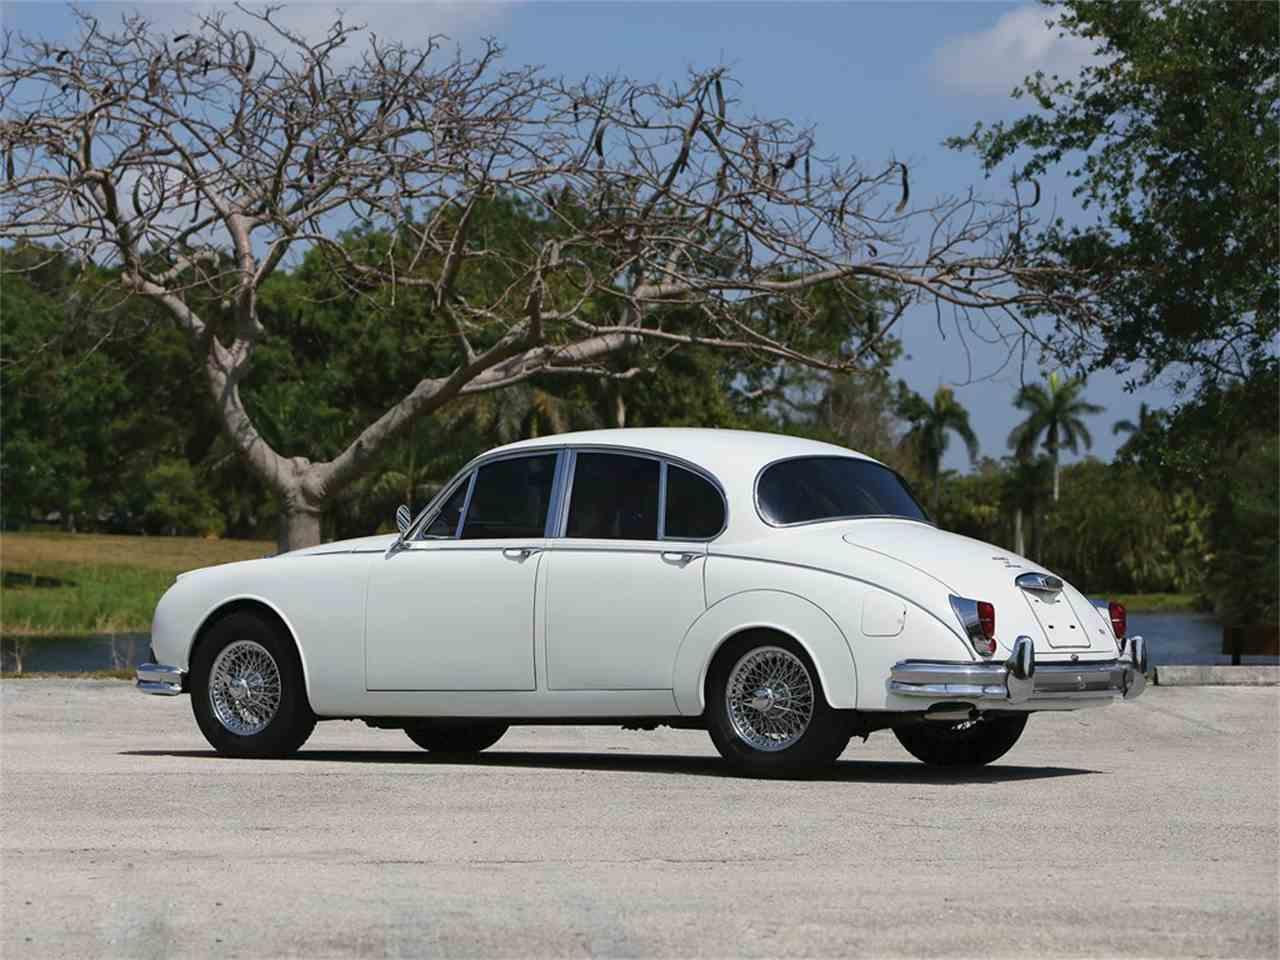 florida near classic car fort xk import for sale jaguar cars lauderdale